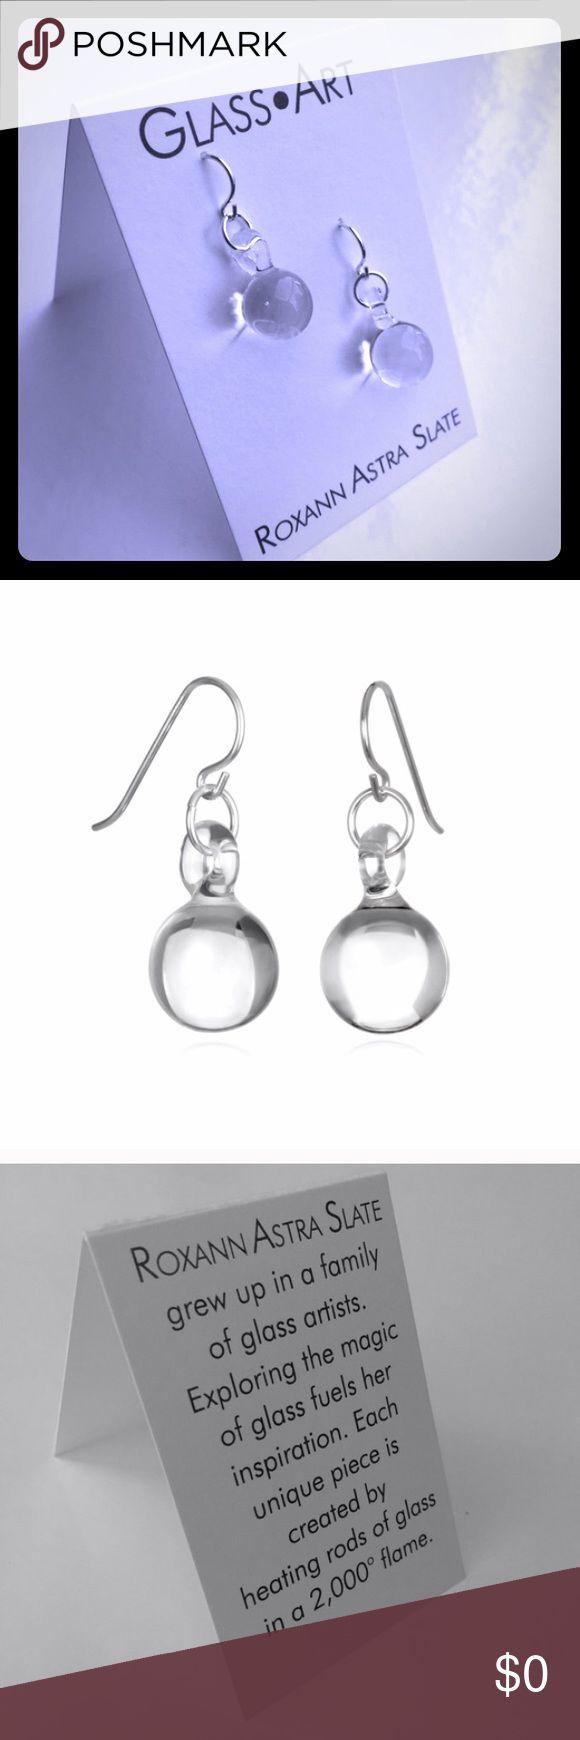 Glass Art Sterling Silver Ball Drop Earrings Simply gorgeous handmade Glass Single Ball Drop Earrings made in Brooklyn, NY USA!                 Material: Borosilicate Glass & Sterling Silver Roxann Slate Jewelry Earrings